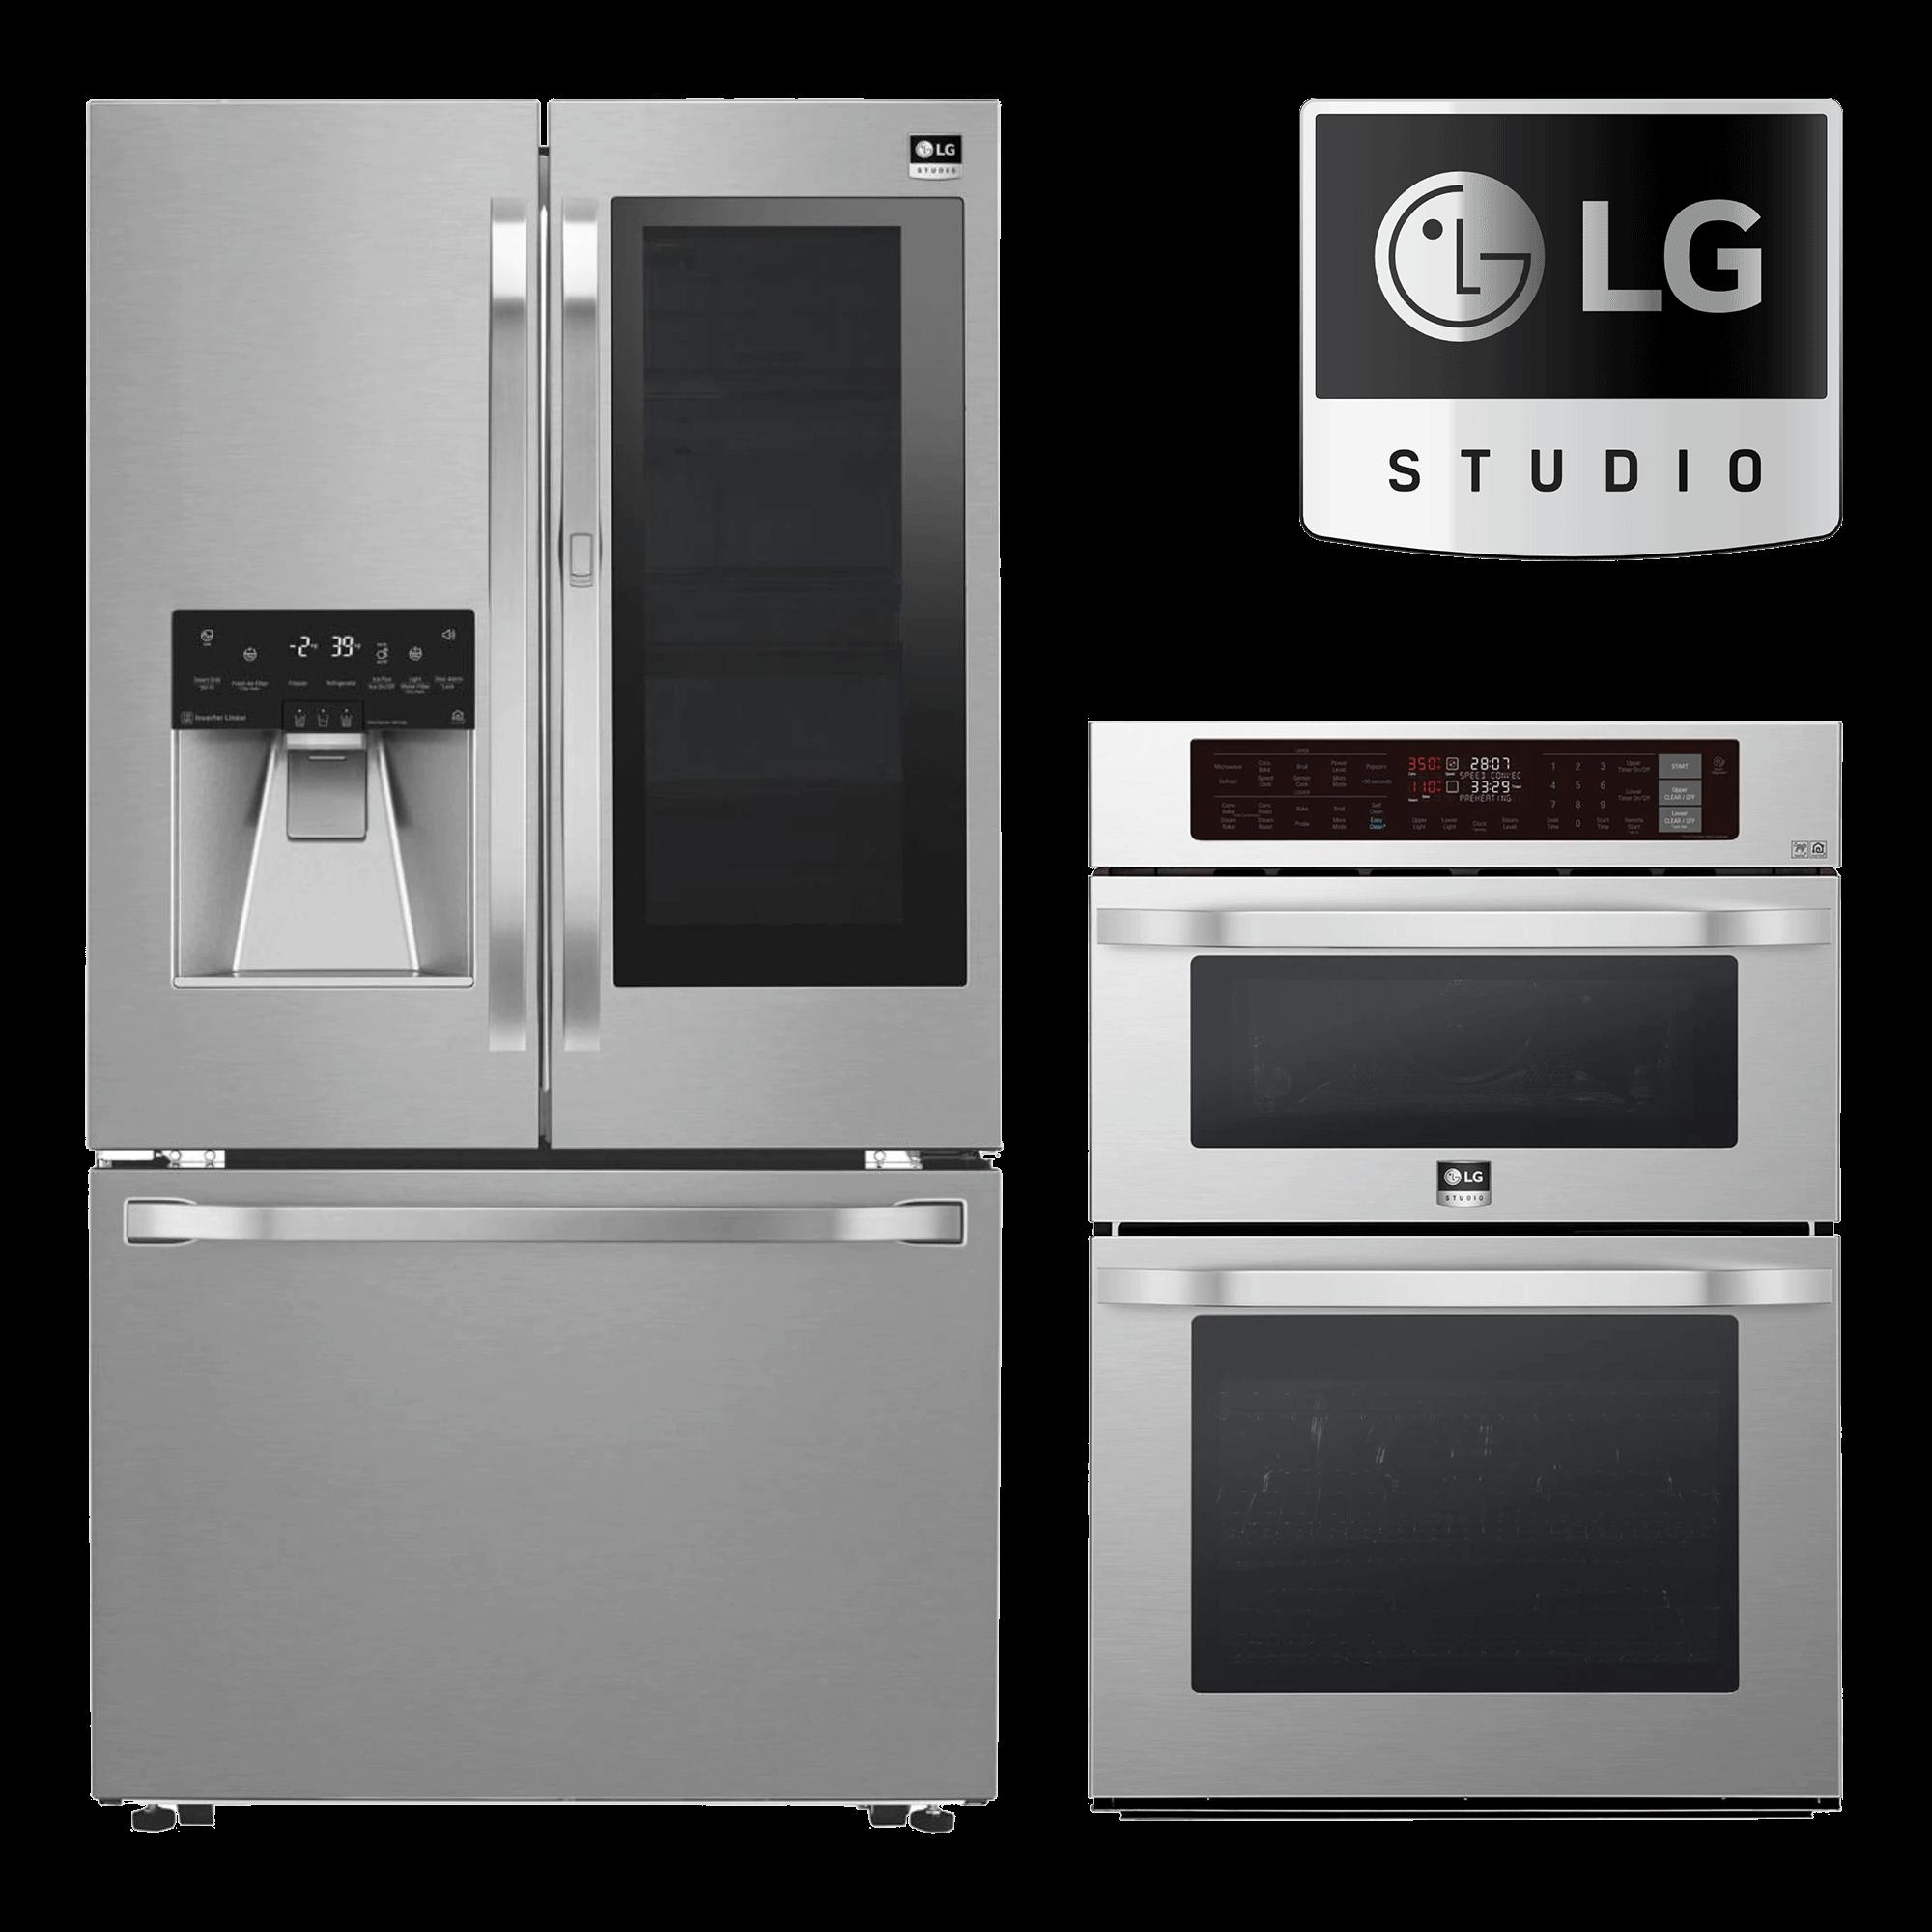 LG Studio Fridge, Range and LG Studio Logo